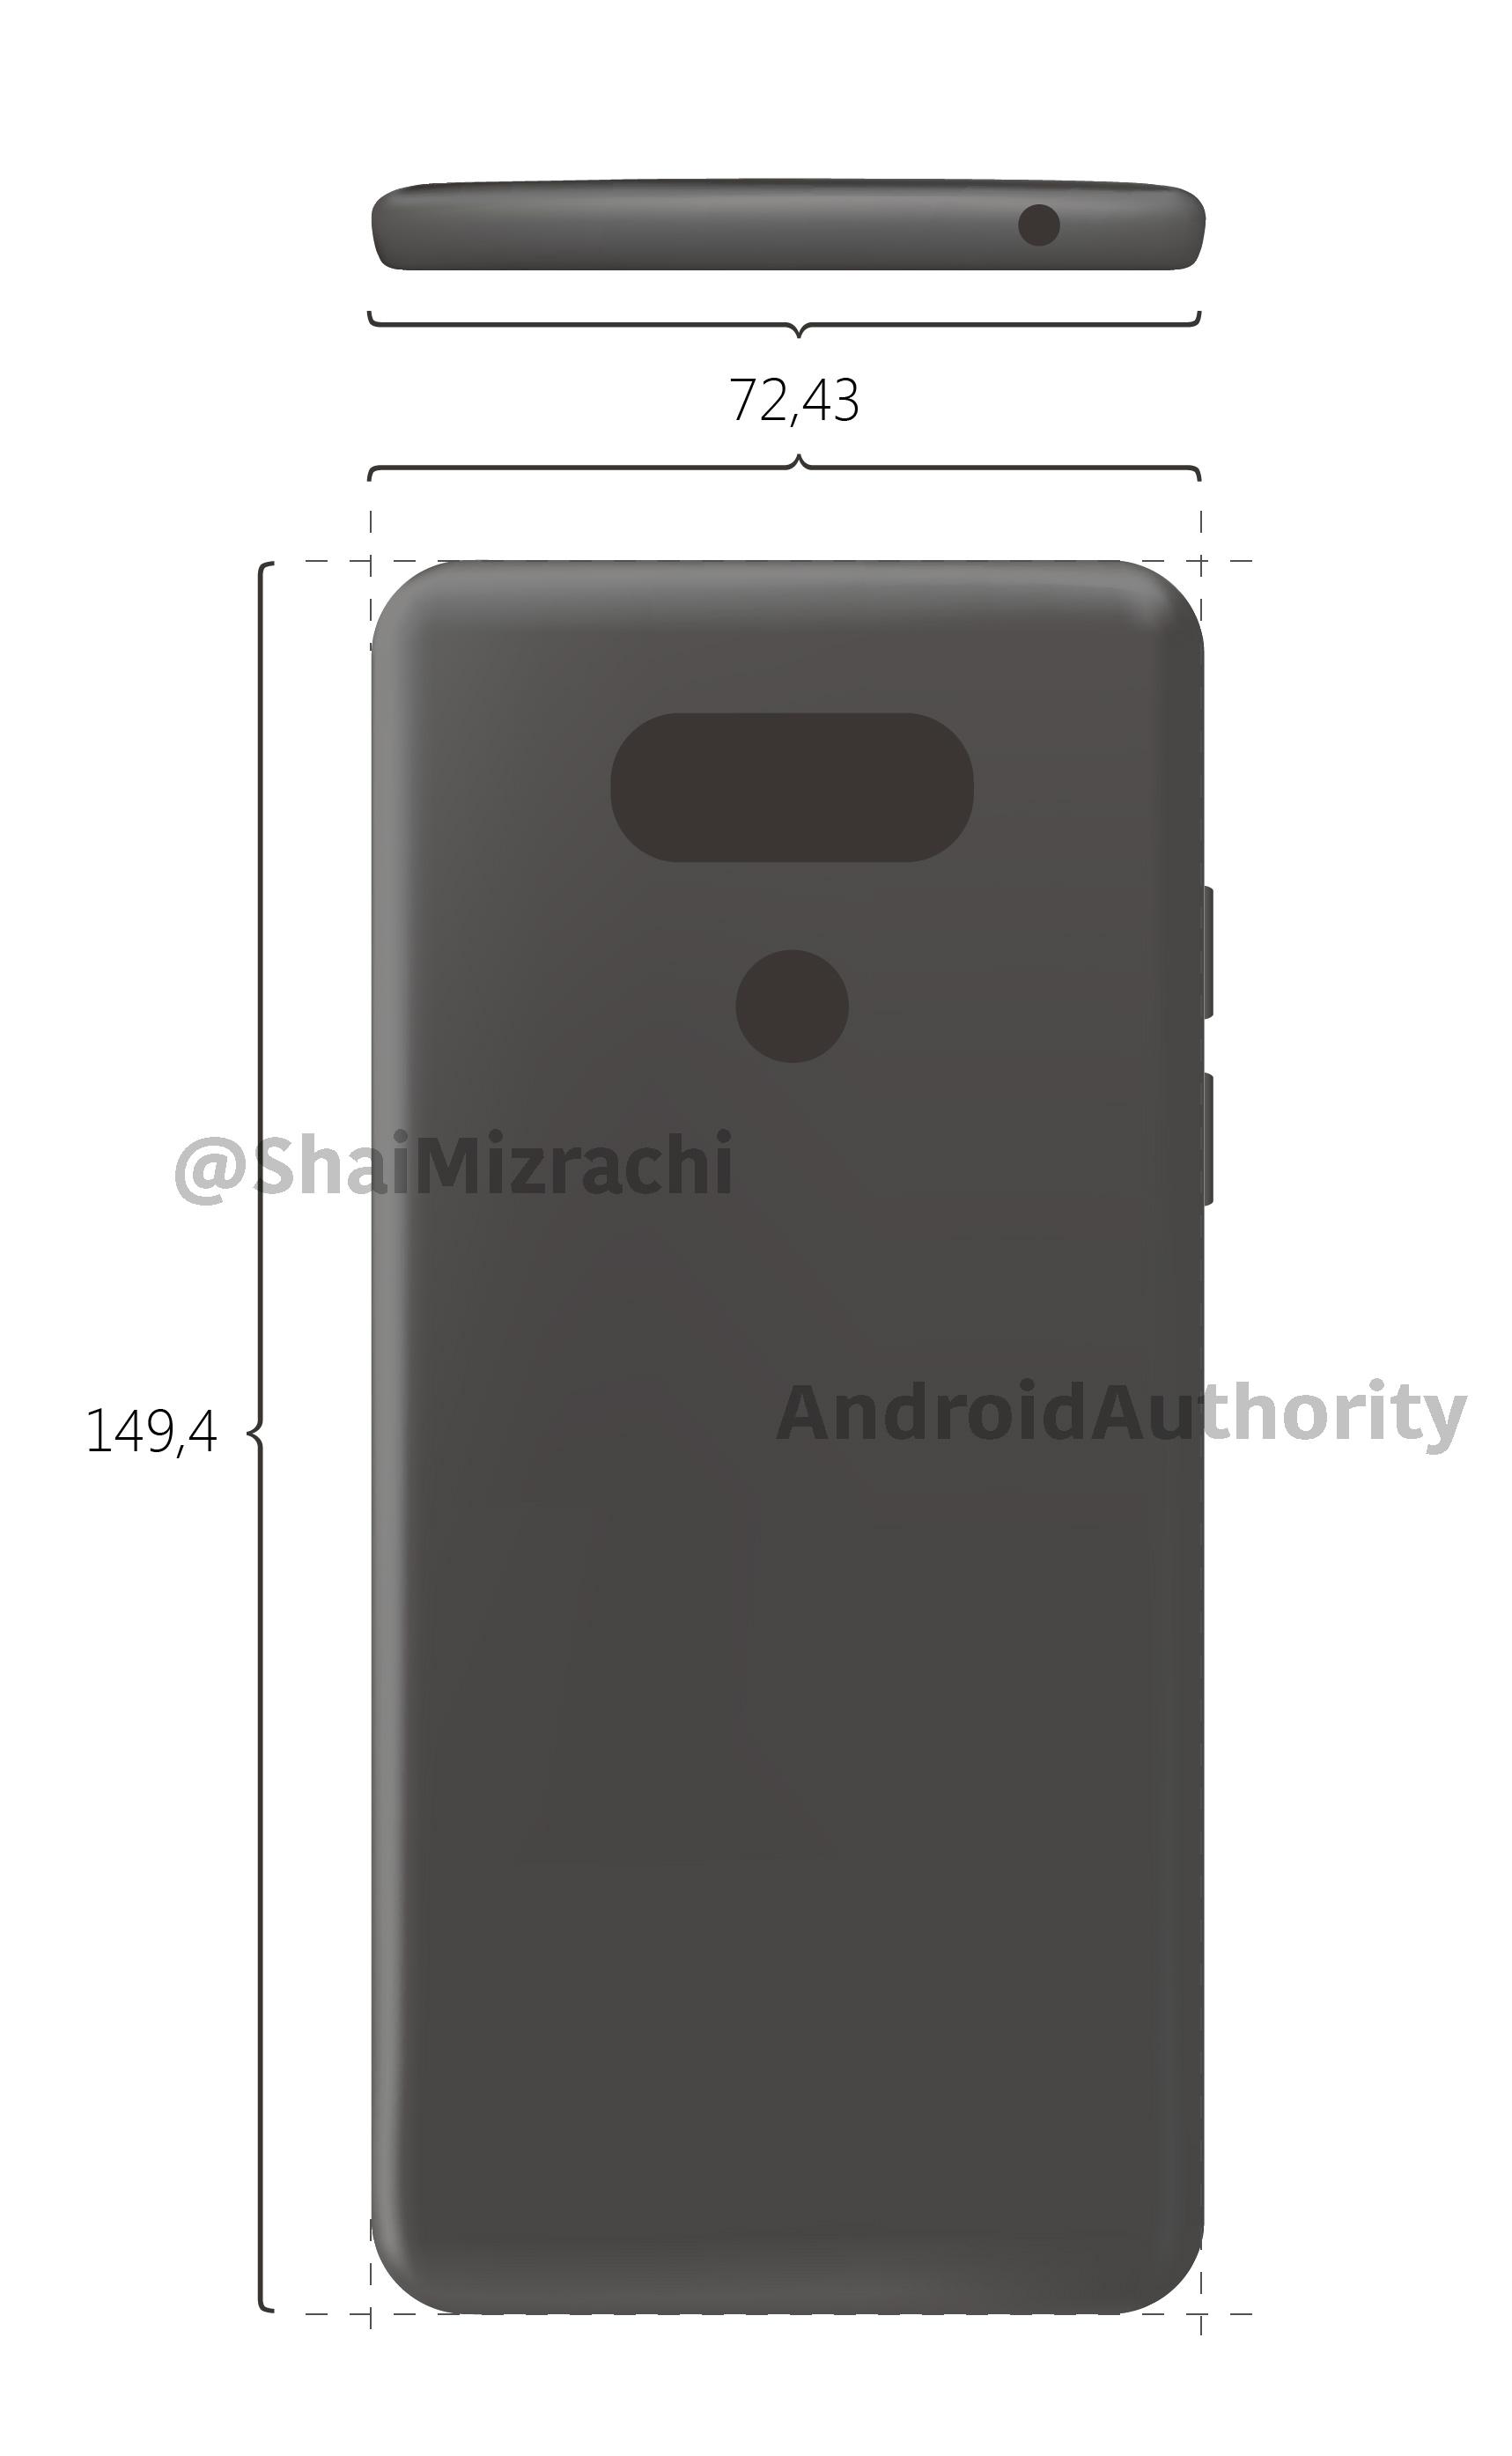 LG G6 leak shai mizrachi android authority